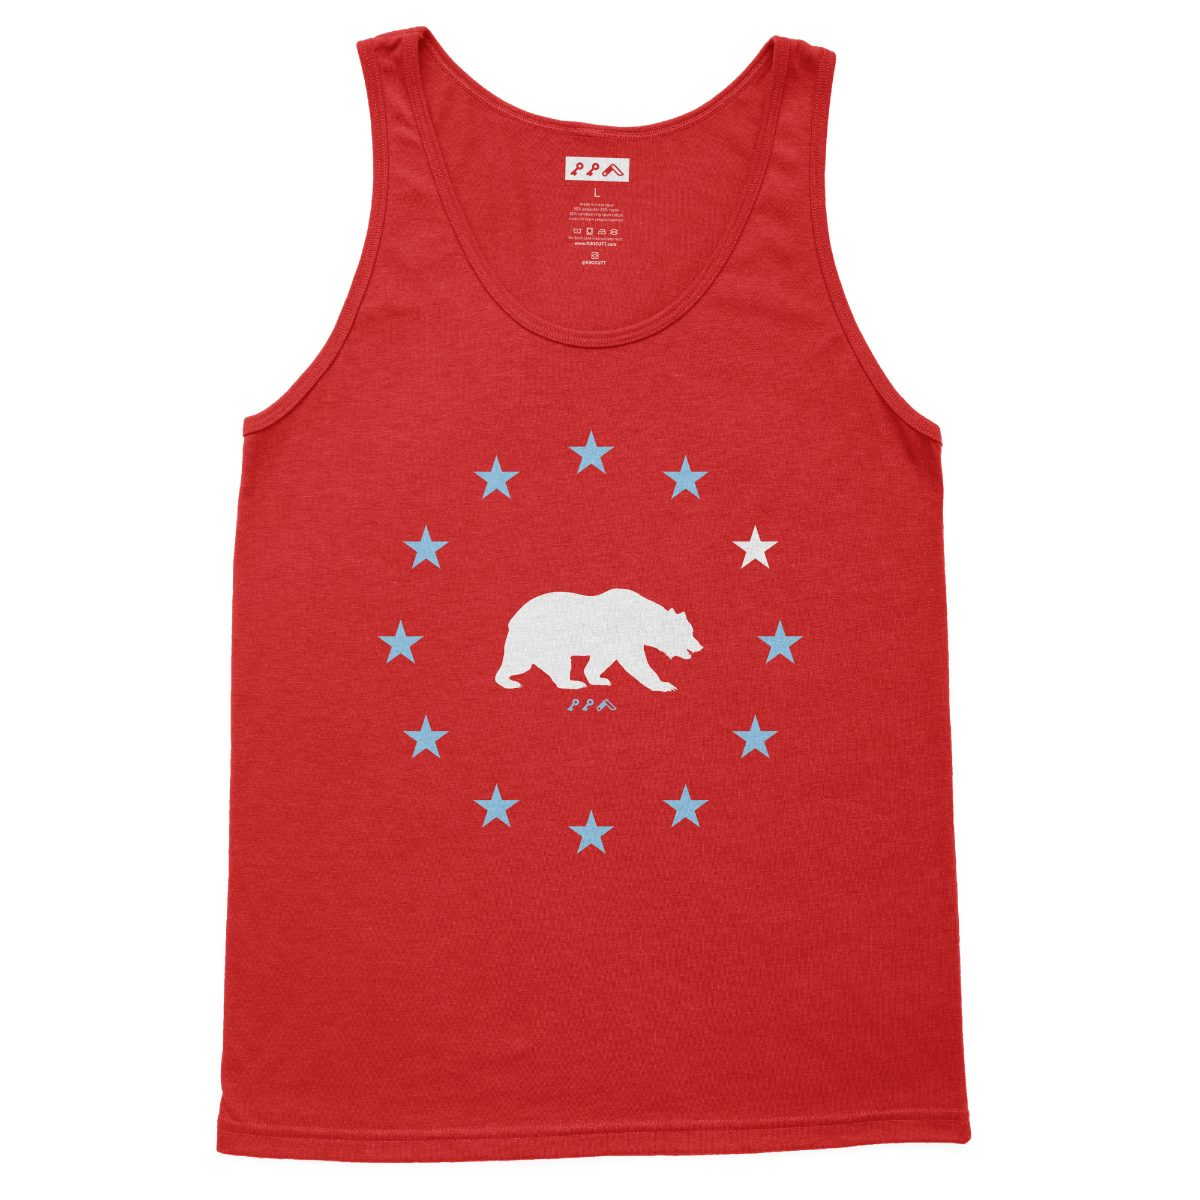 STAR GAZING california bear beach tank tops in red at kikicutt.com